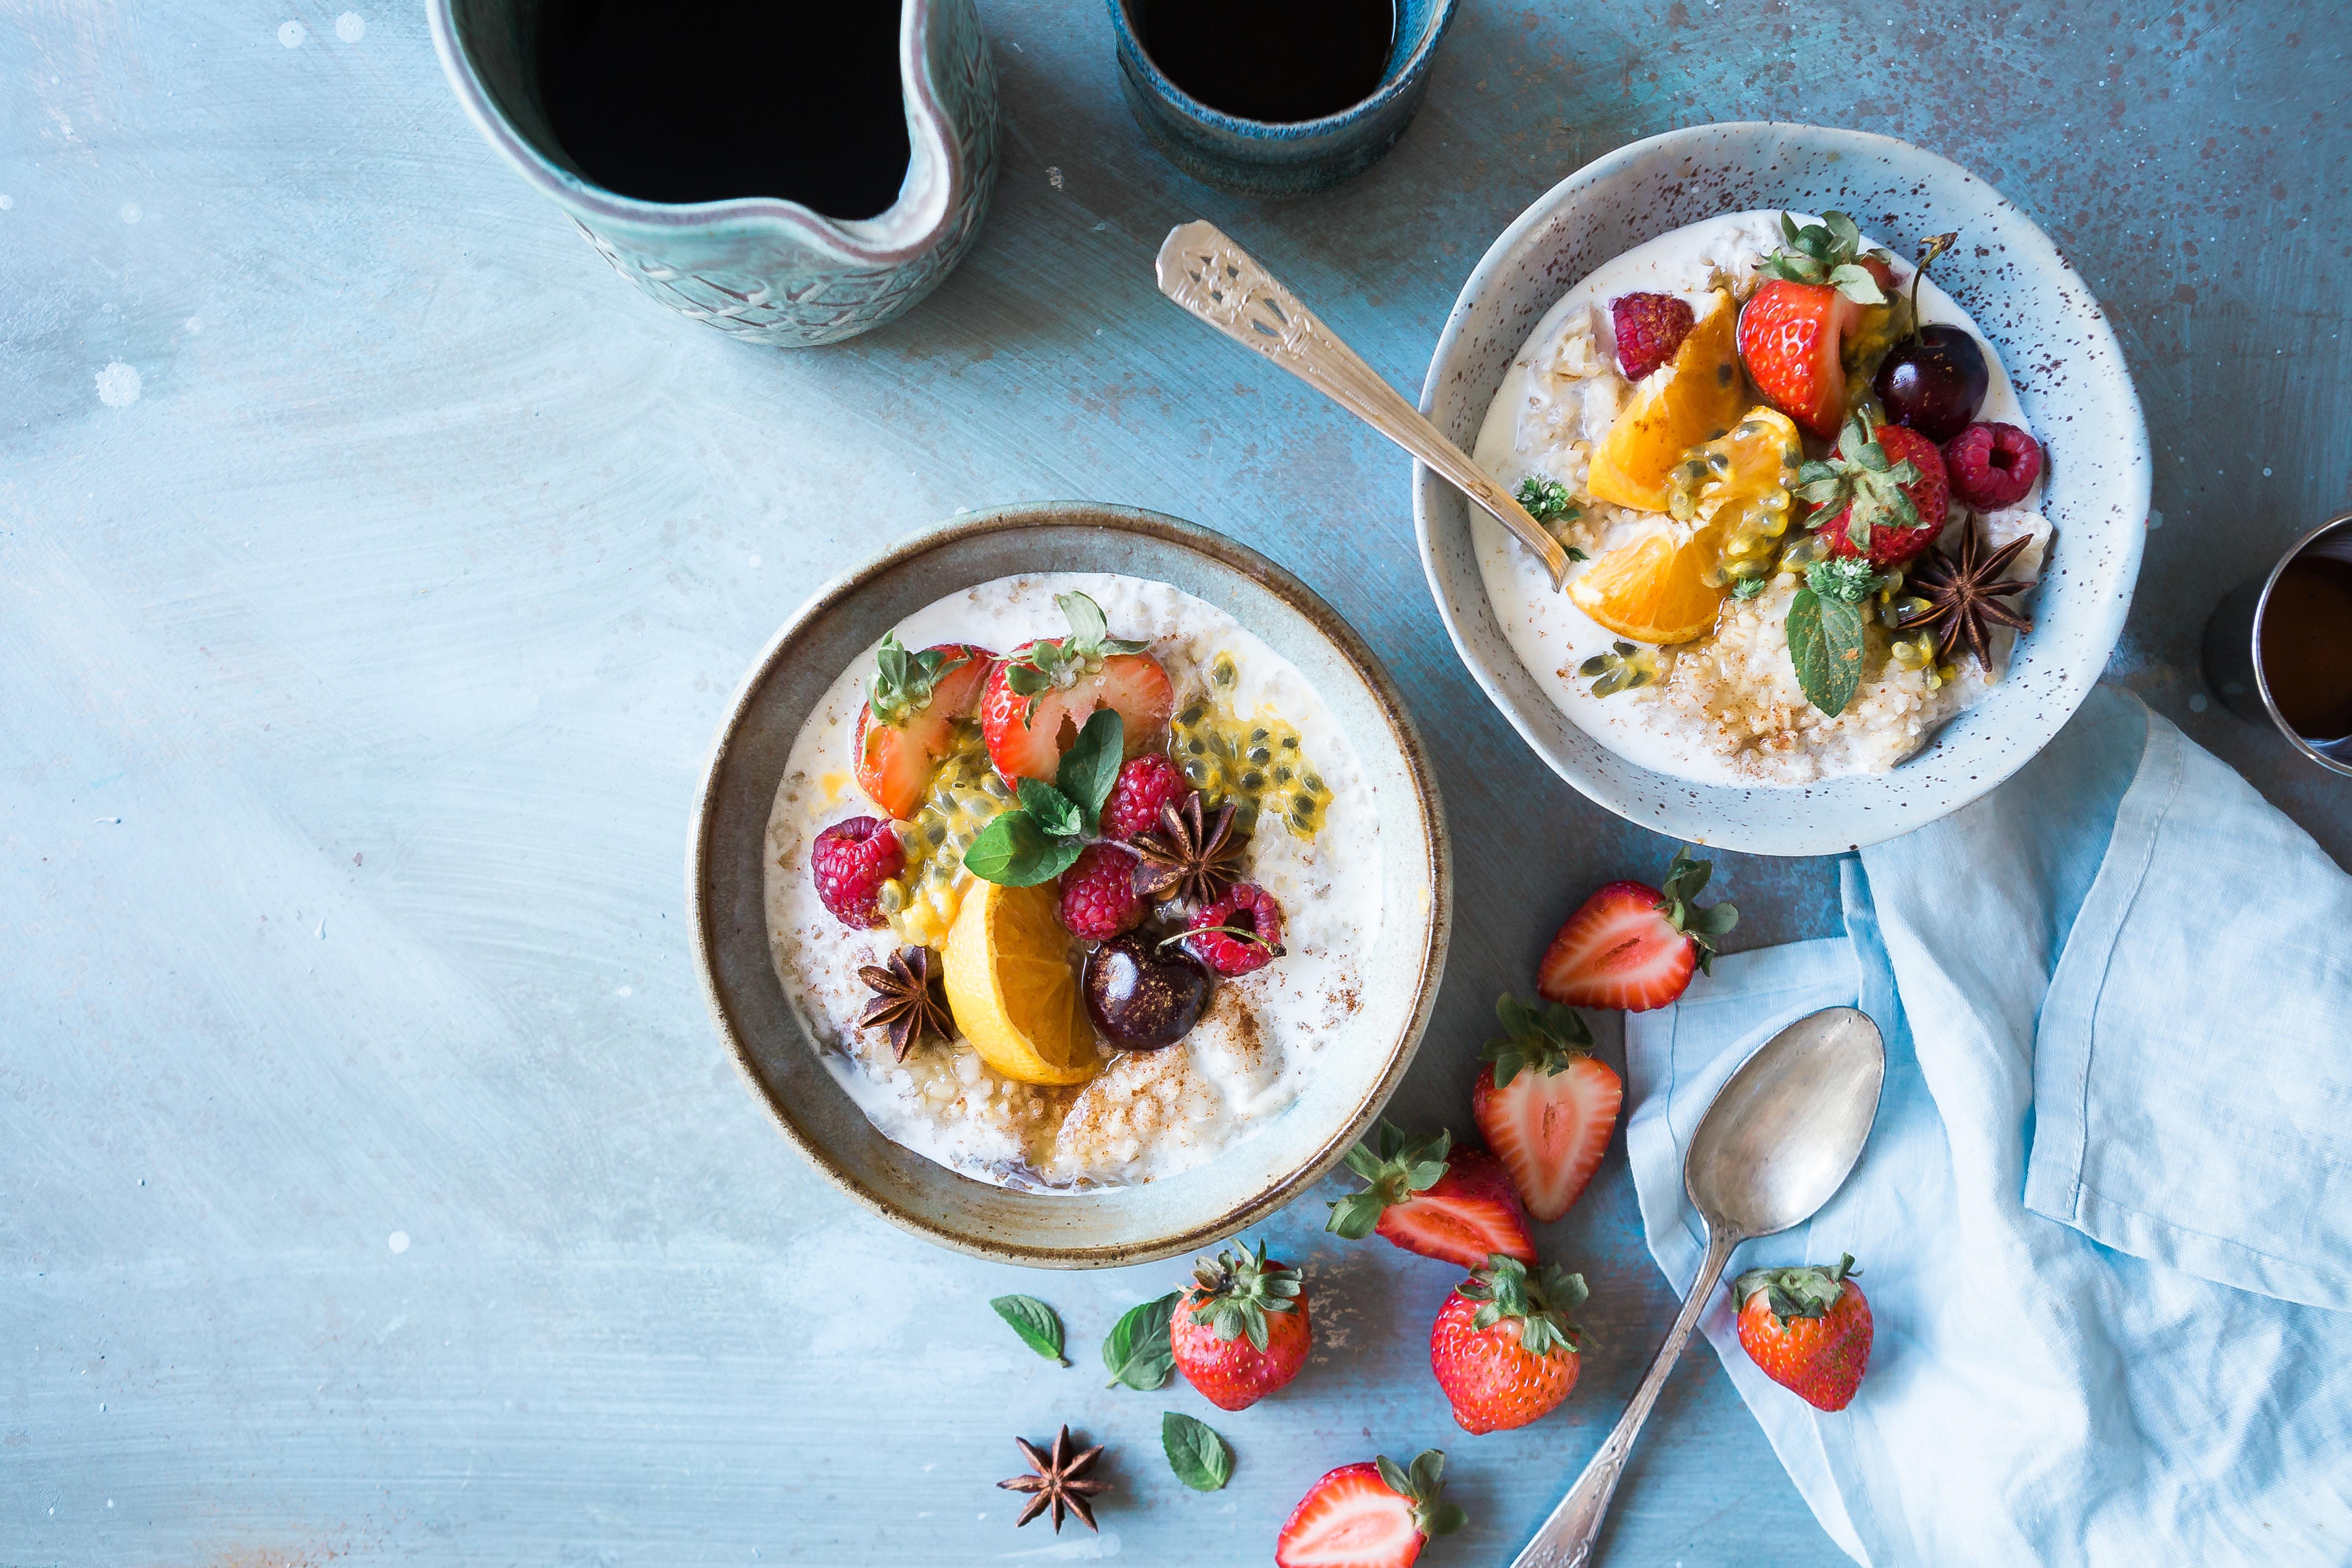 healthy carbs oatmeal and fruit breakfast bowl grain bowl